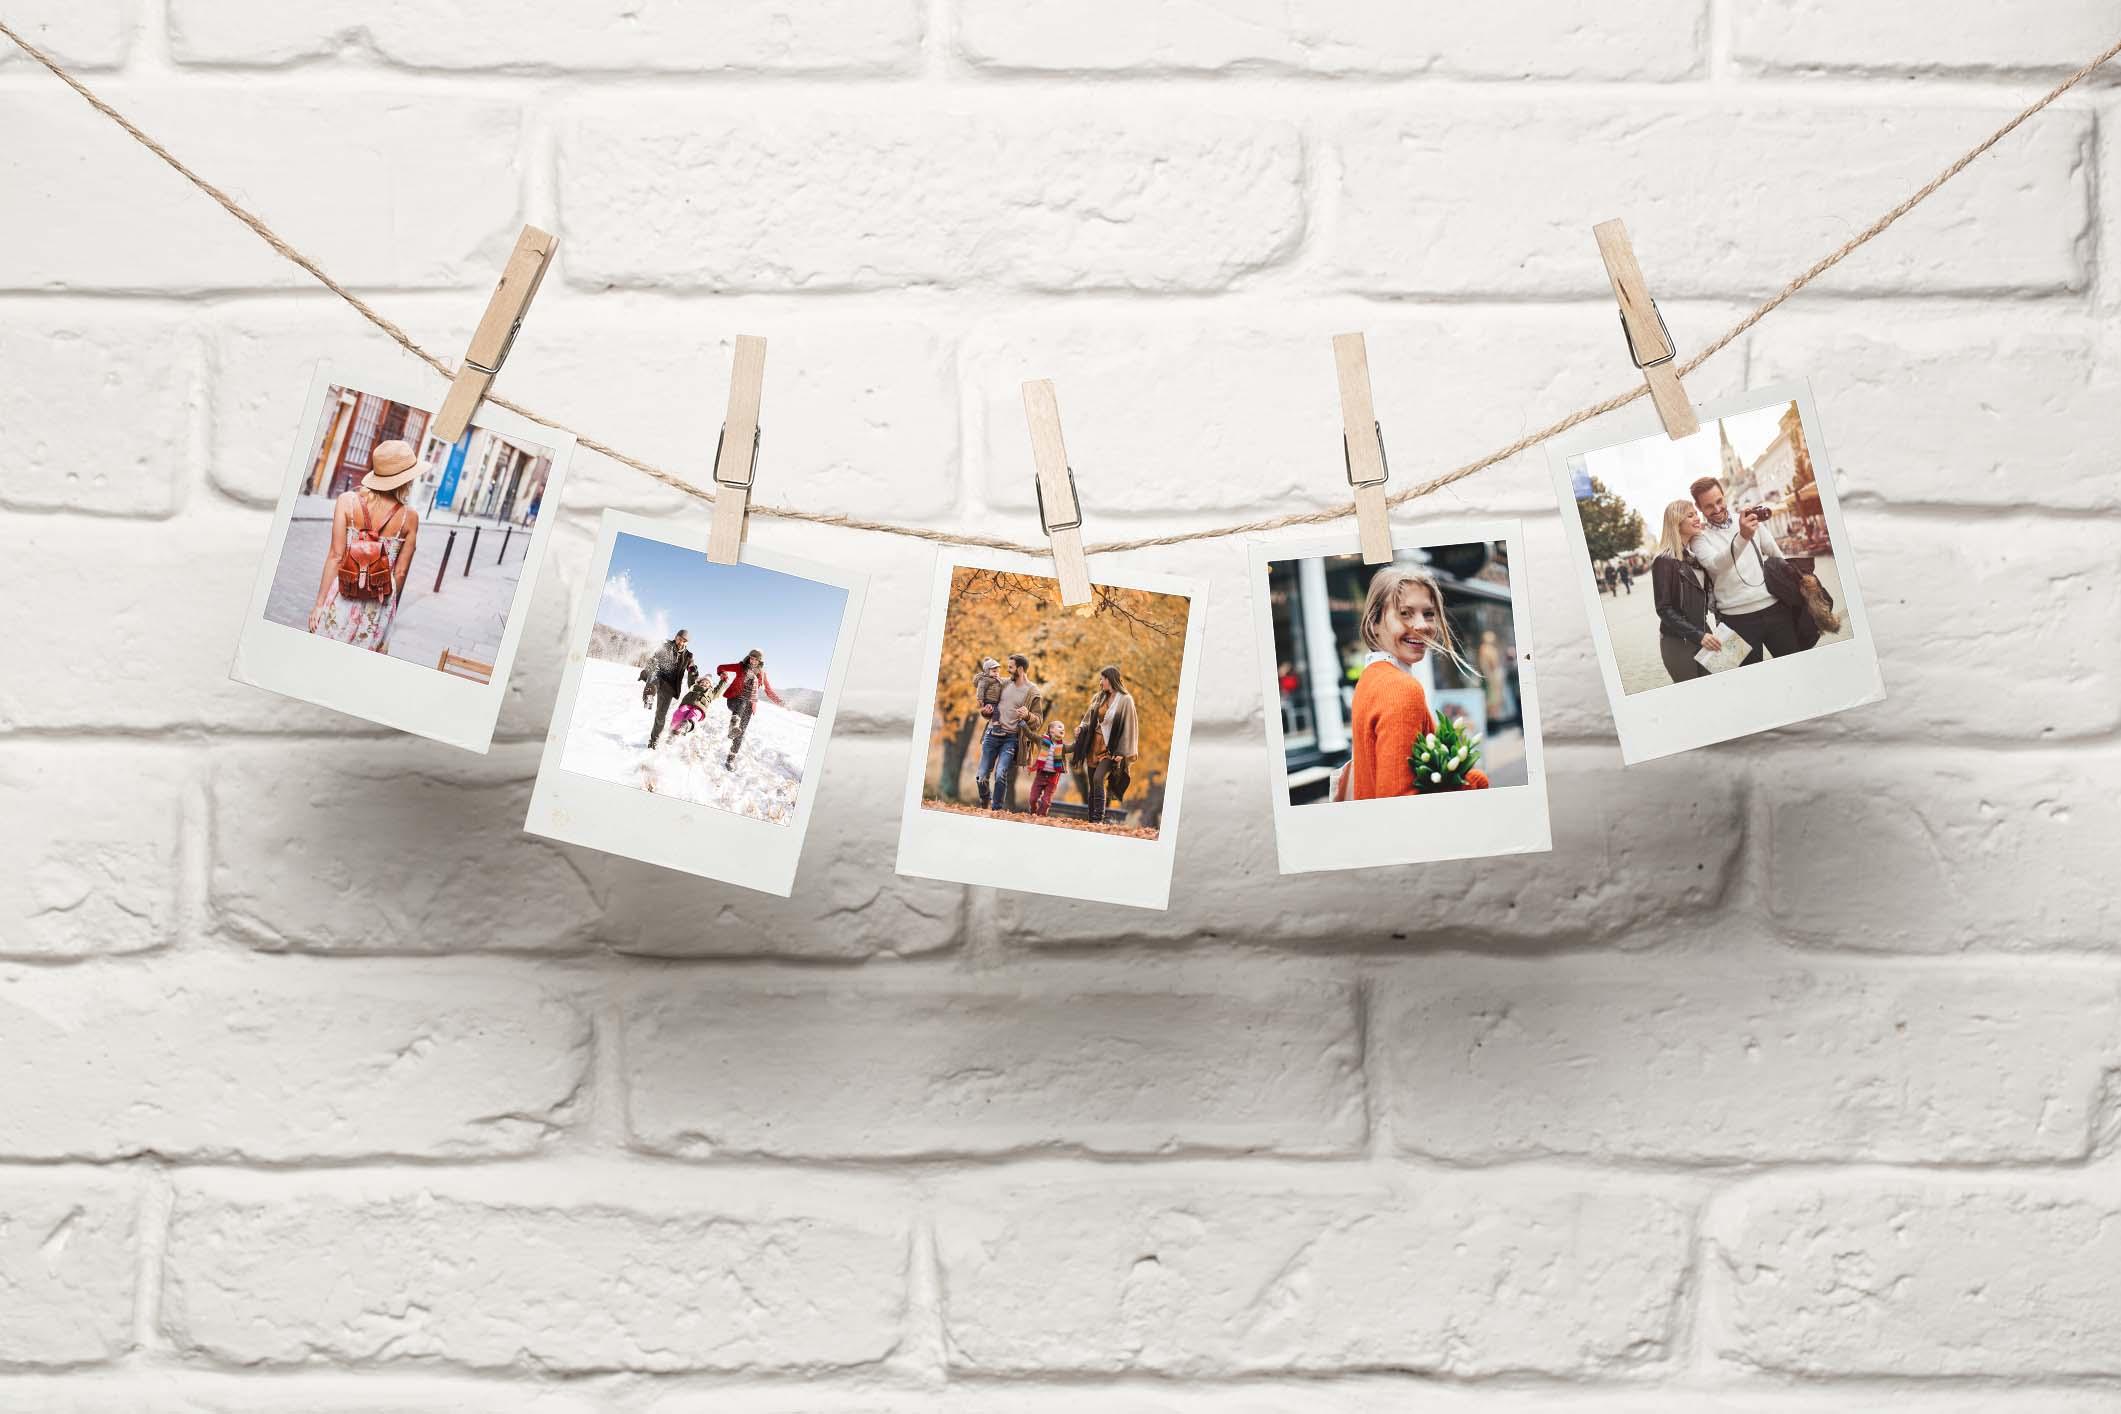 Fotos an Girlande aufgehängt als Fotogeschenke Idee